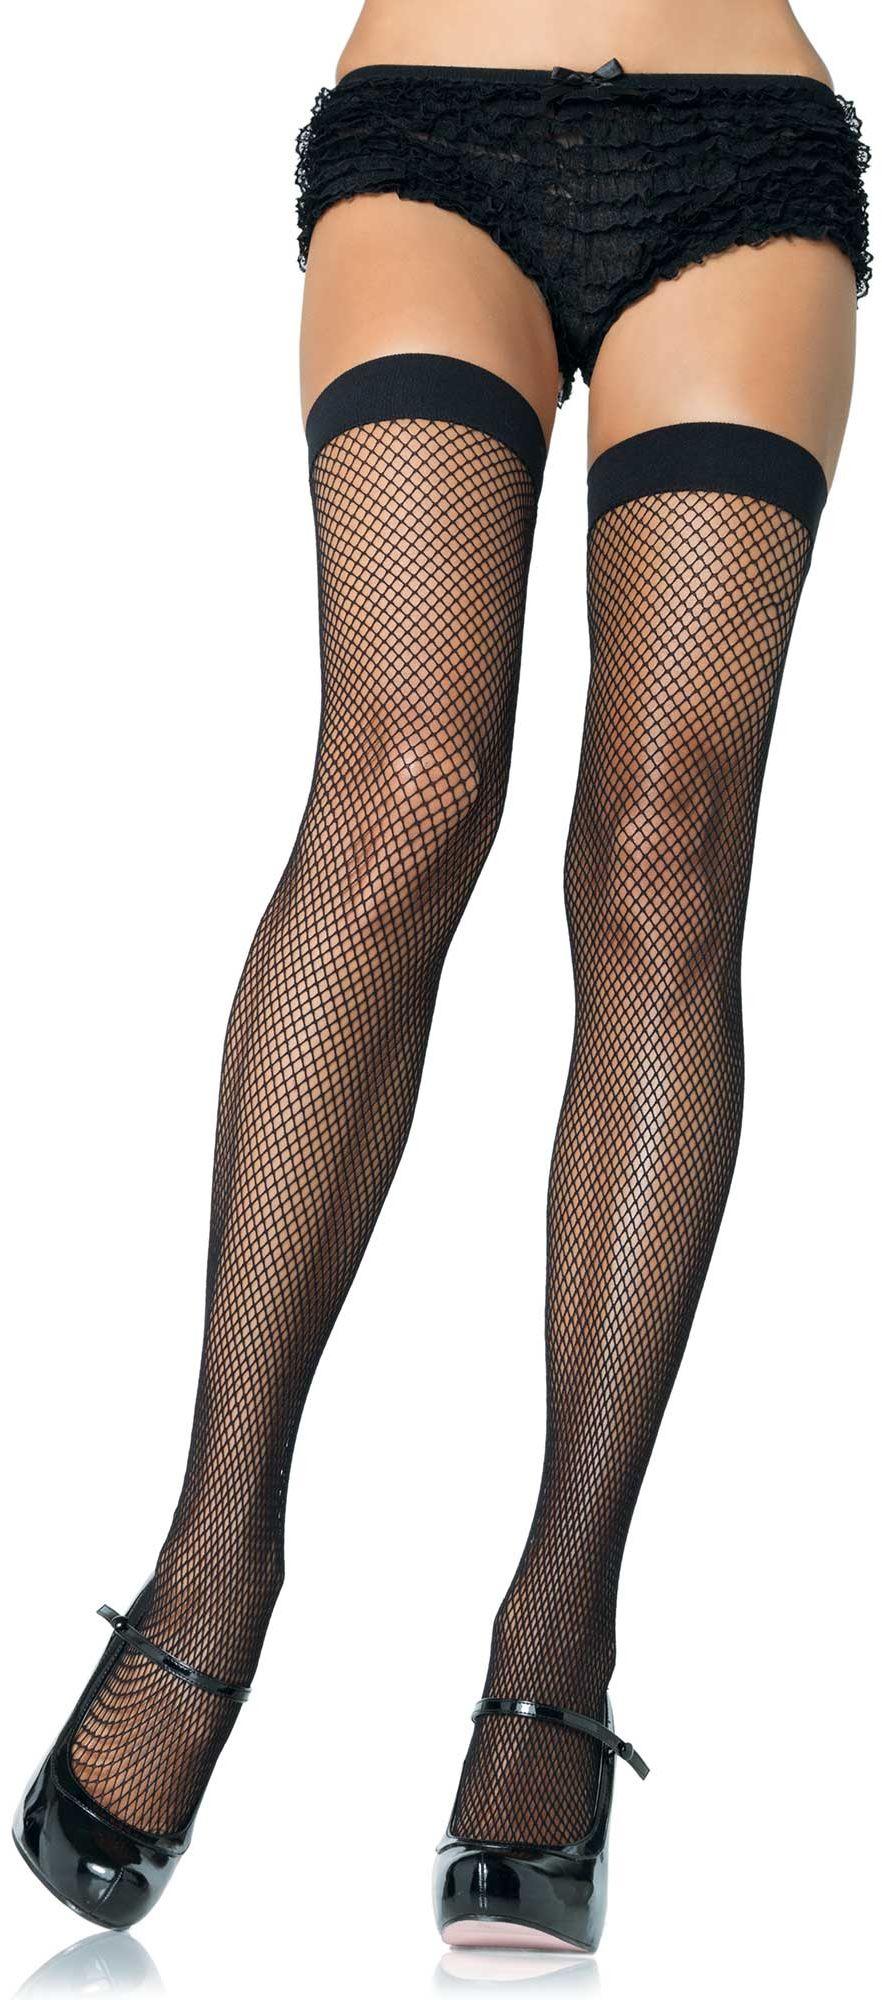 Leg Avenue Nylon Fishnet Thigh Highs 9011 Black